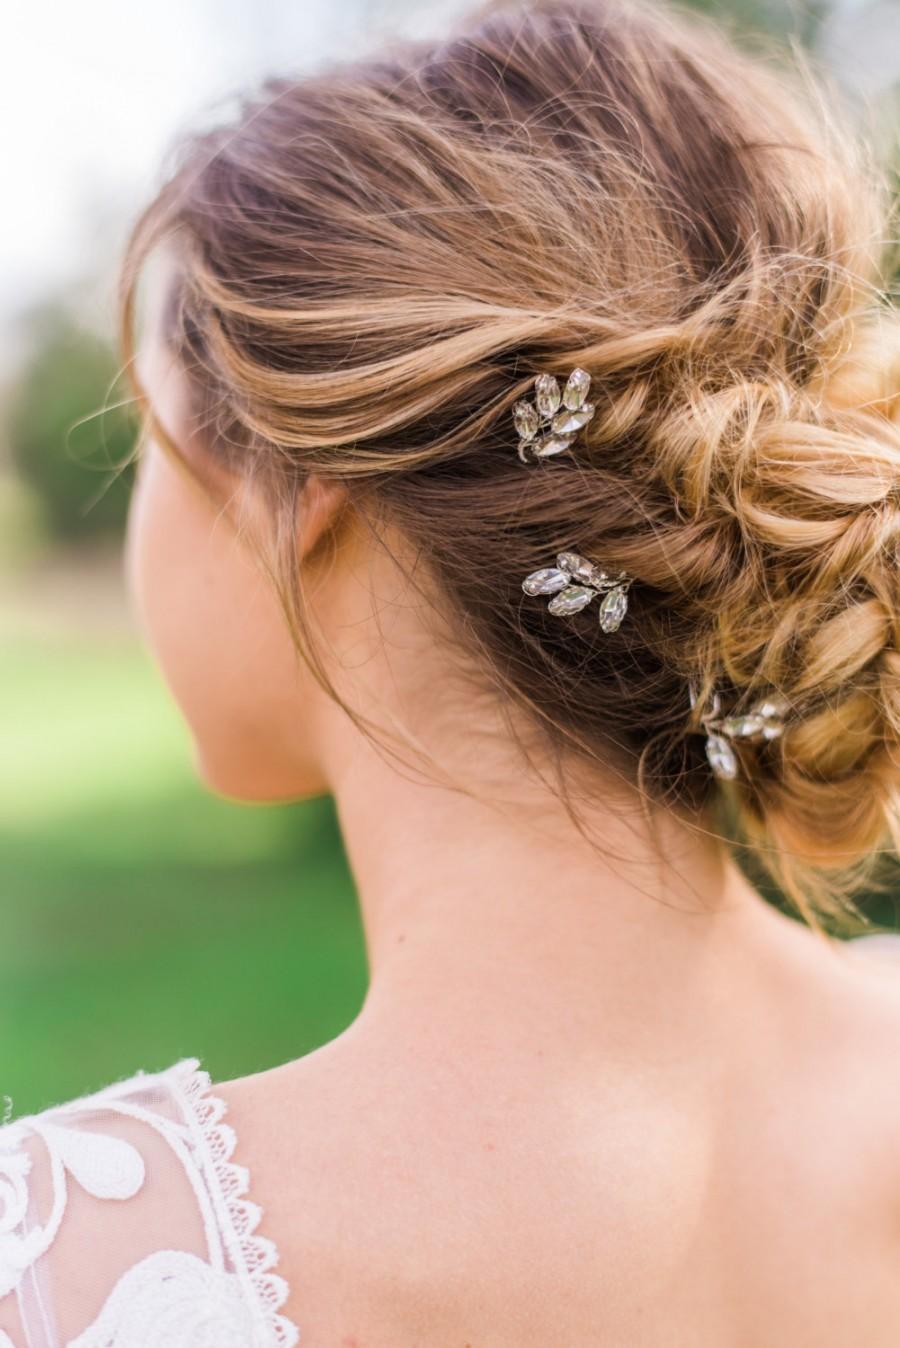 زفاف - Set of 3 Crystal Laurel Pins laurel leaf pins crystal hair pins bridal hair pins gold hair pins silver hair pins wedding hair pins #128